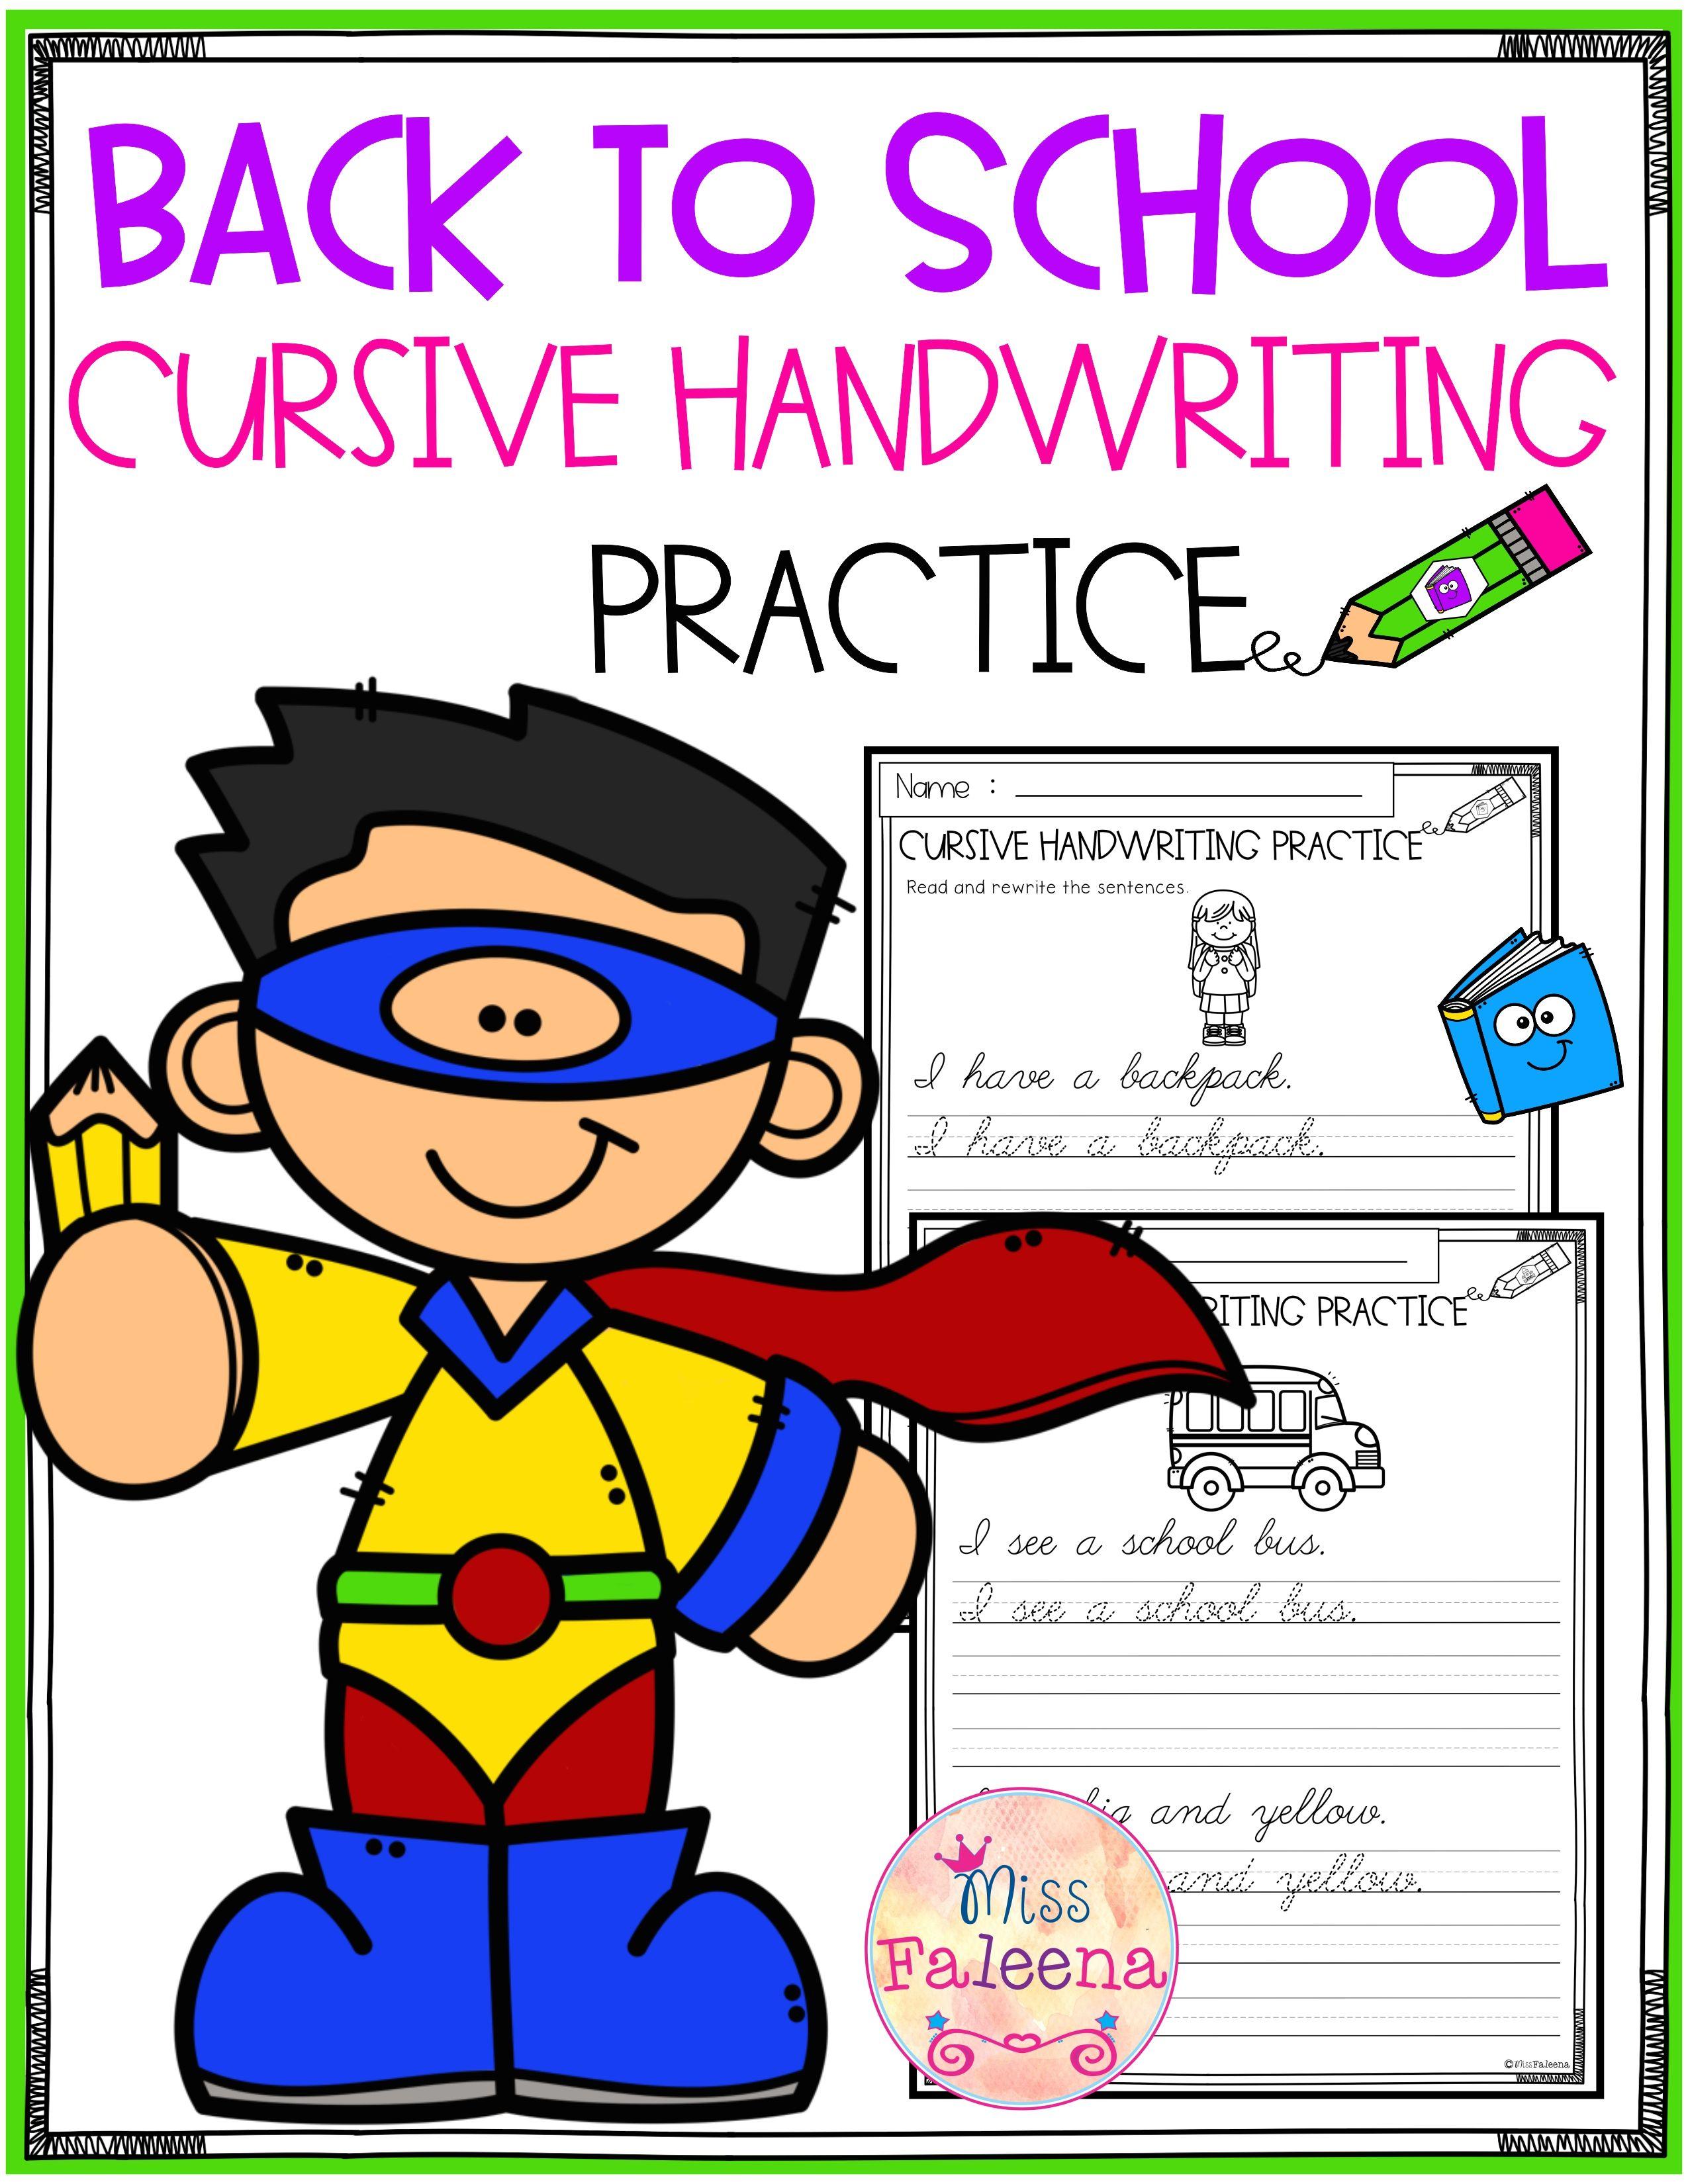 Back To School Cursive Handwriting Practice